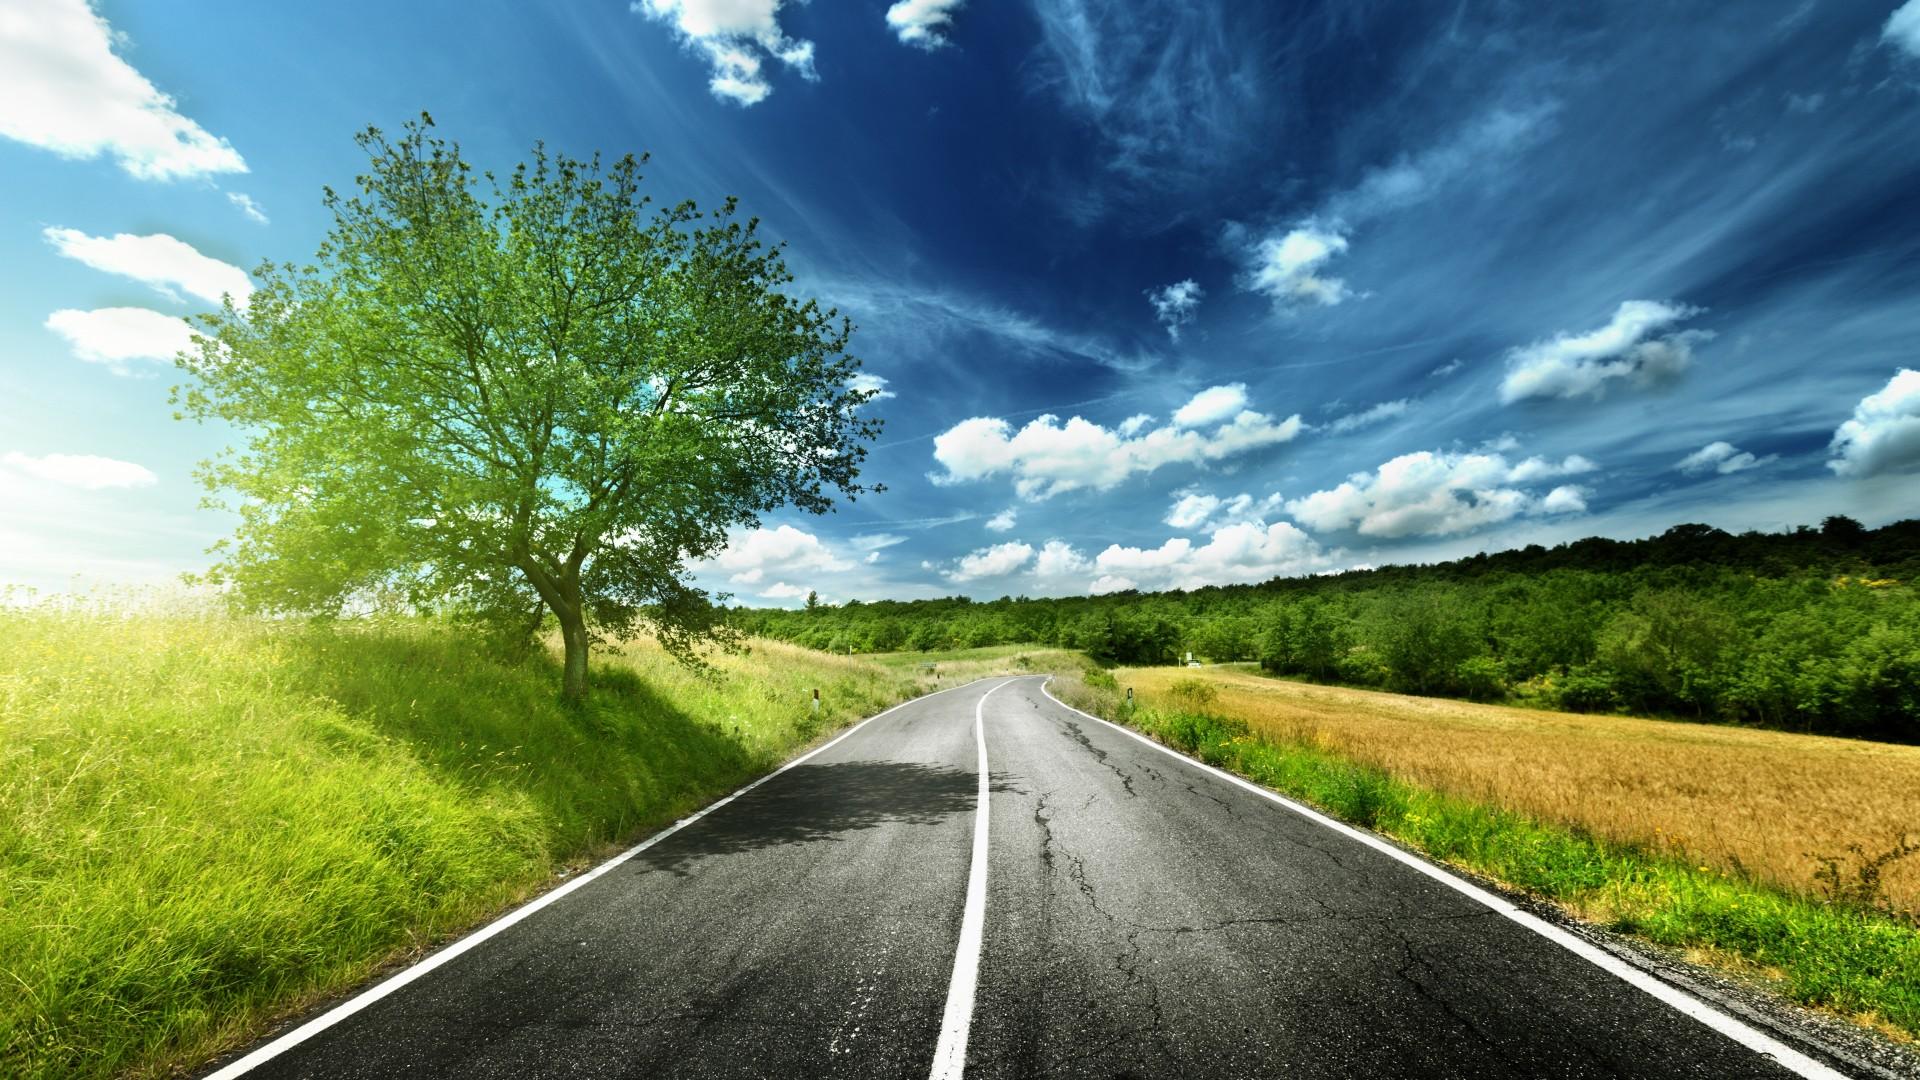 Grass nature landscapes roads trees sun sunlight sky